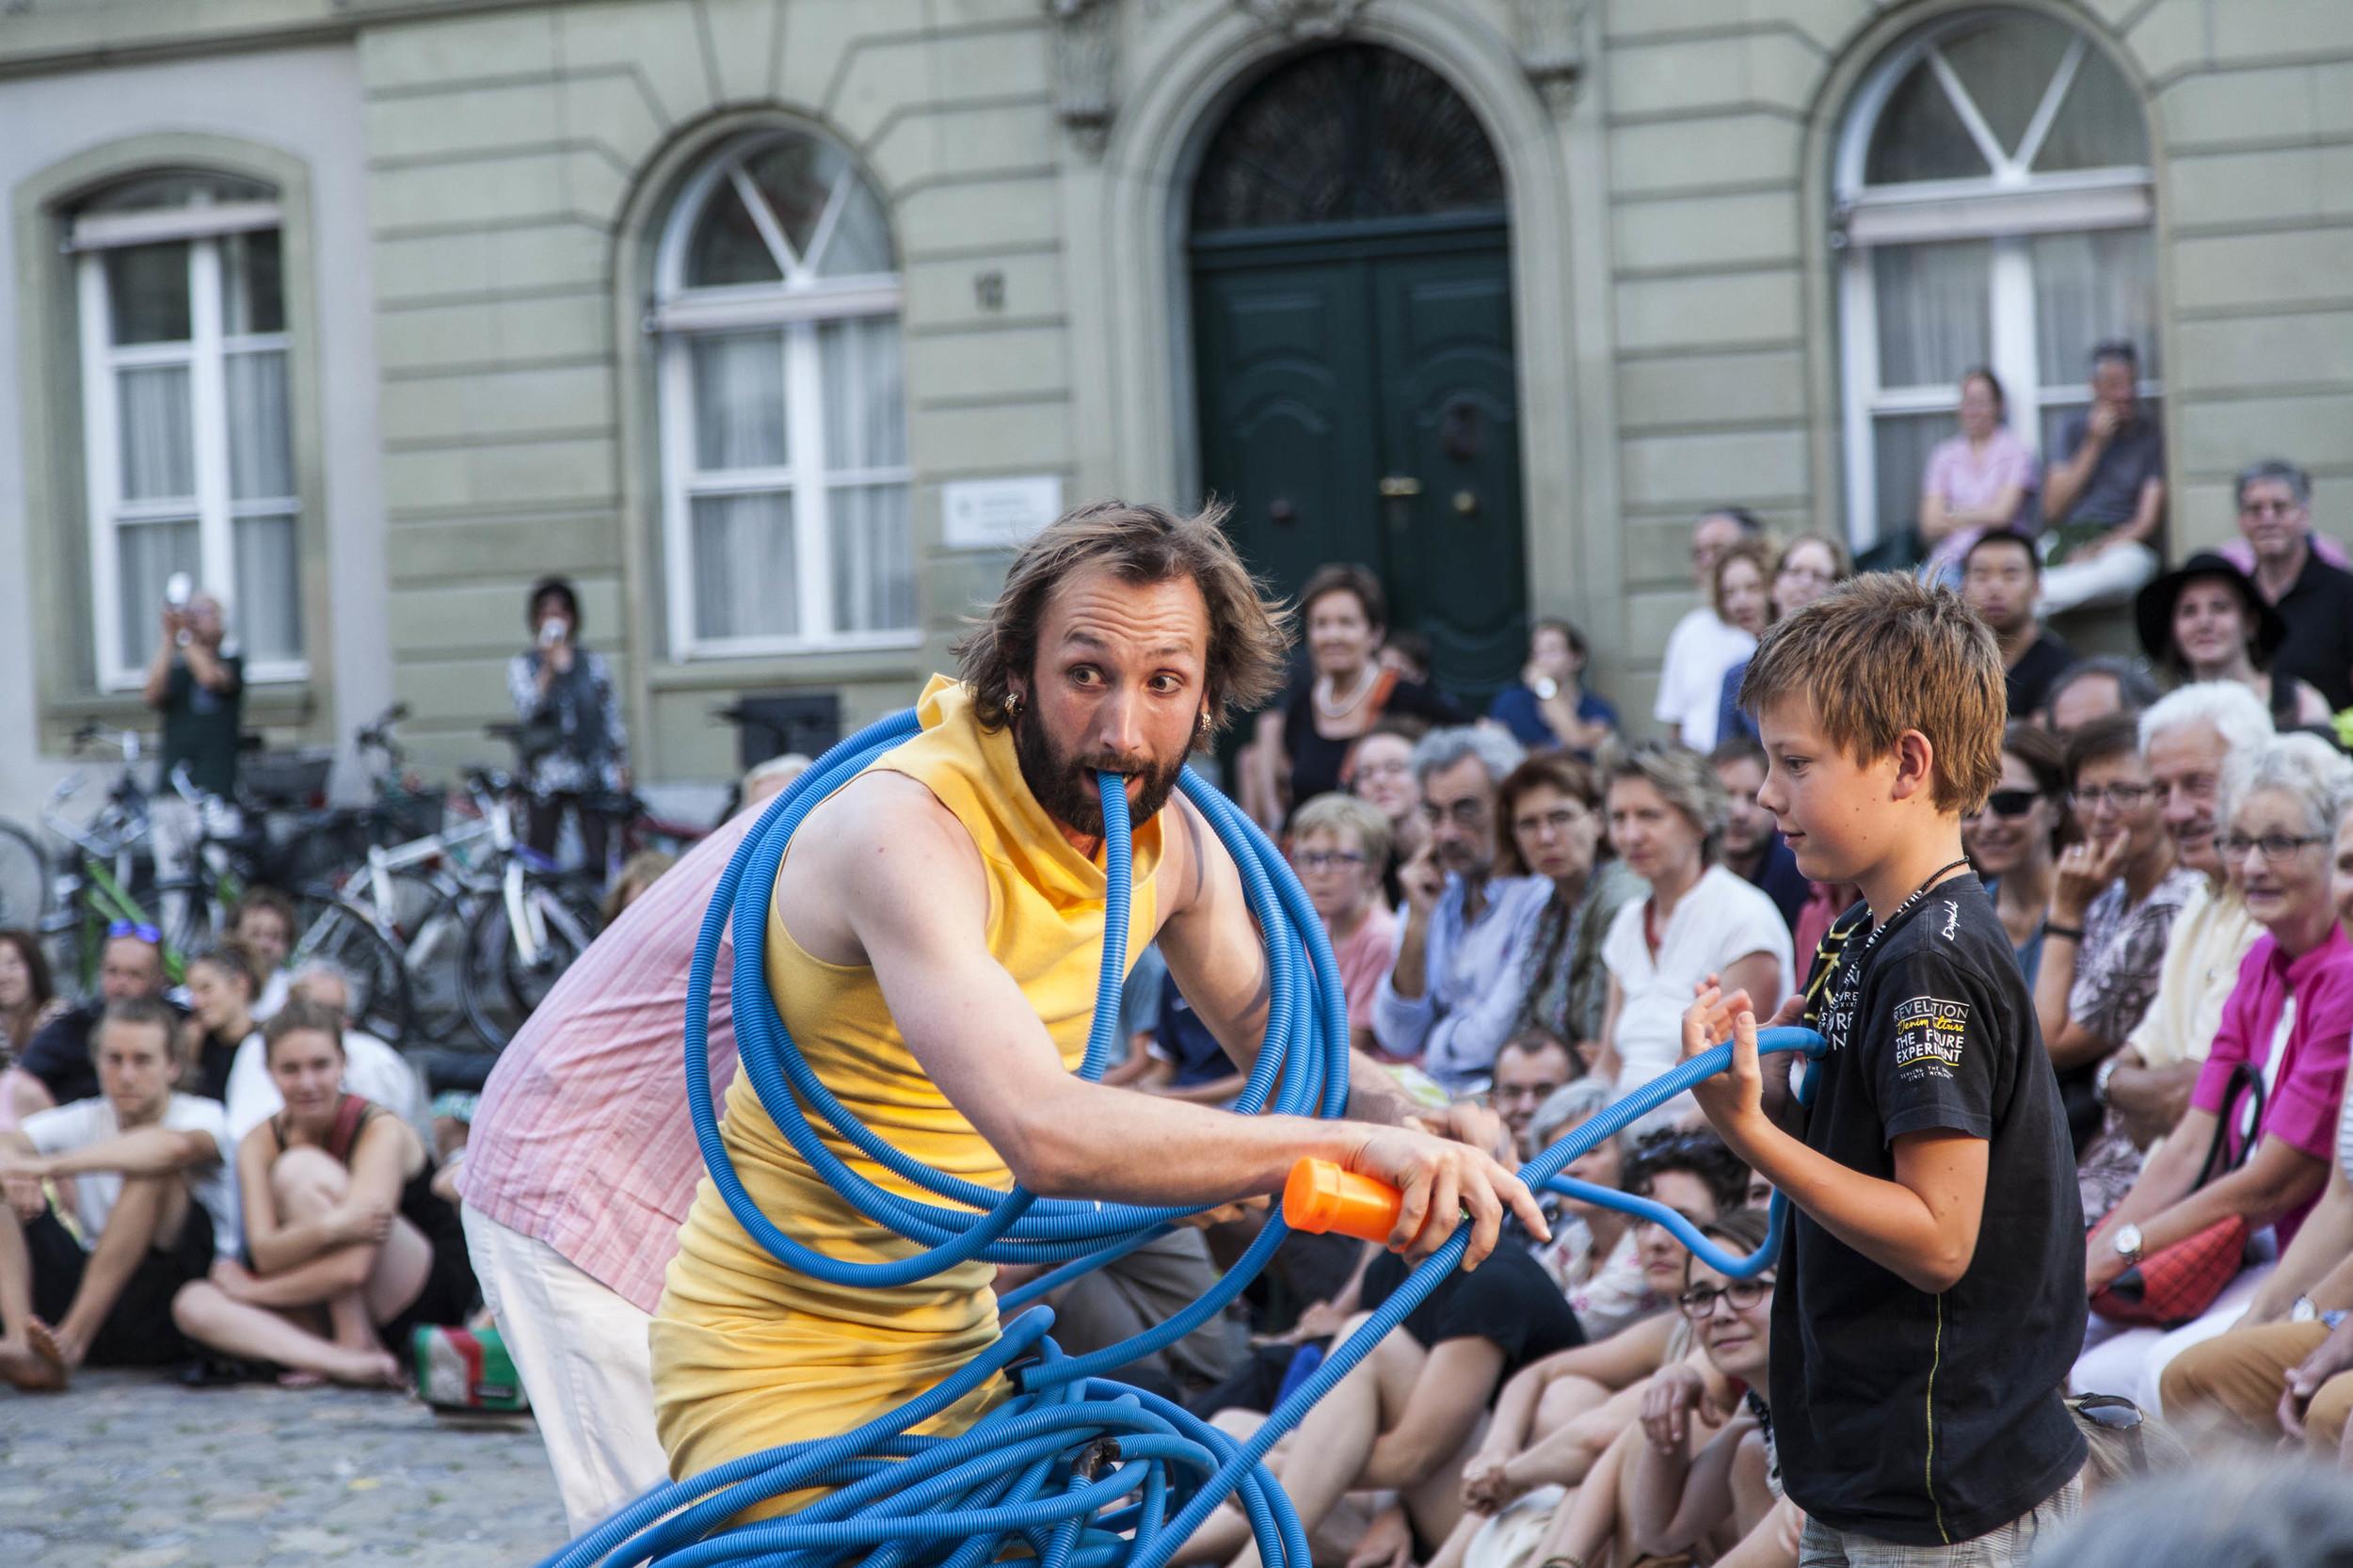 compagnie-trottvoir-2015-sofort-savoire-vivre_show_16.jpg